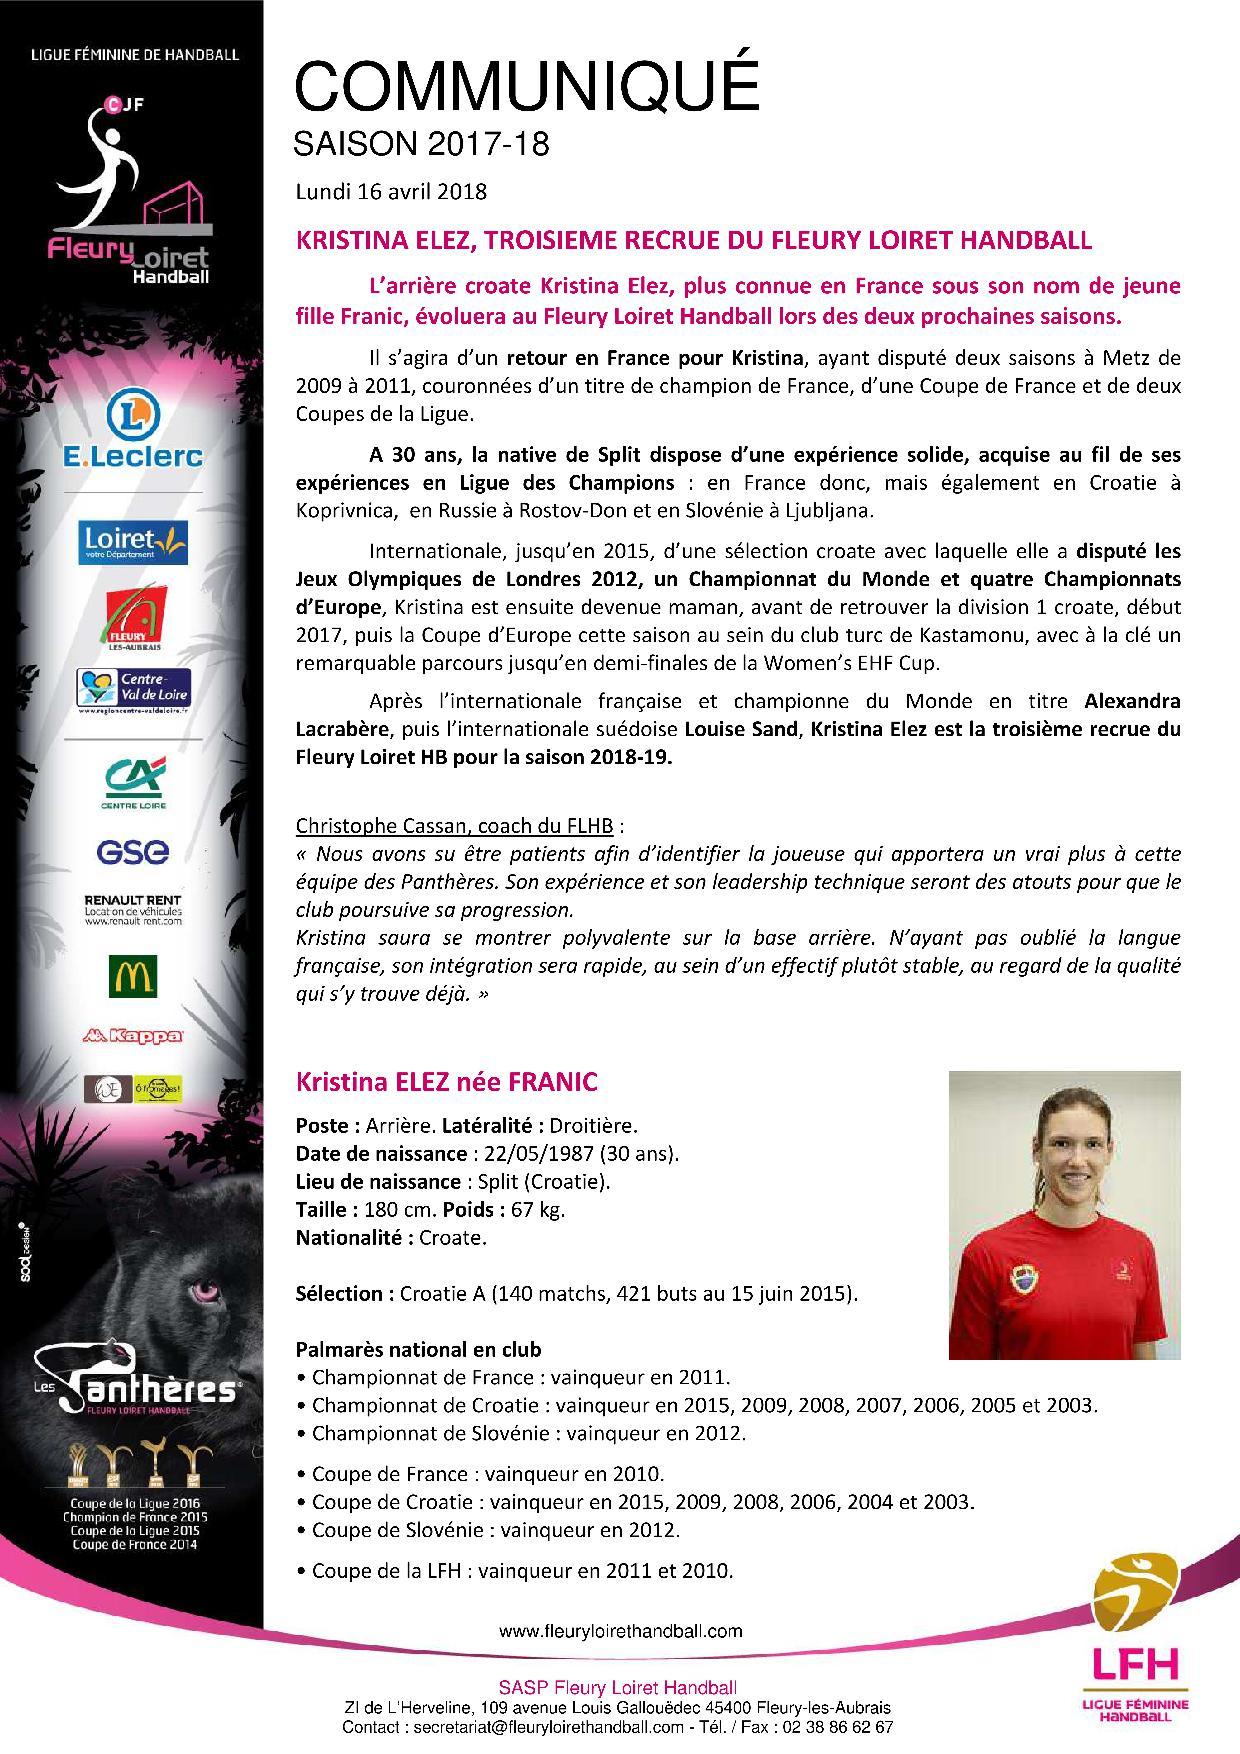 C_Users_Jose_AppData_Local_Temp_Communiqué Fleury Loiret Handball - Lundi 16 avril 20181.jpg